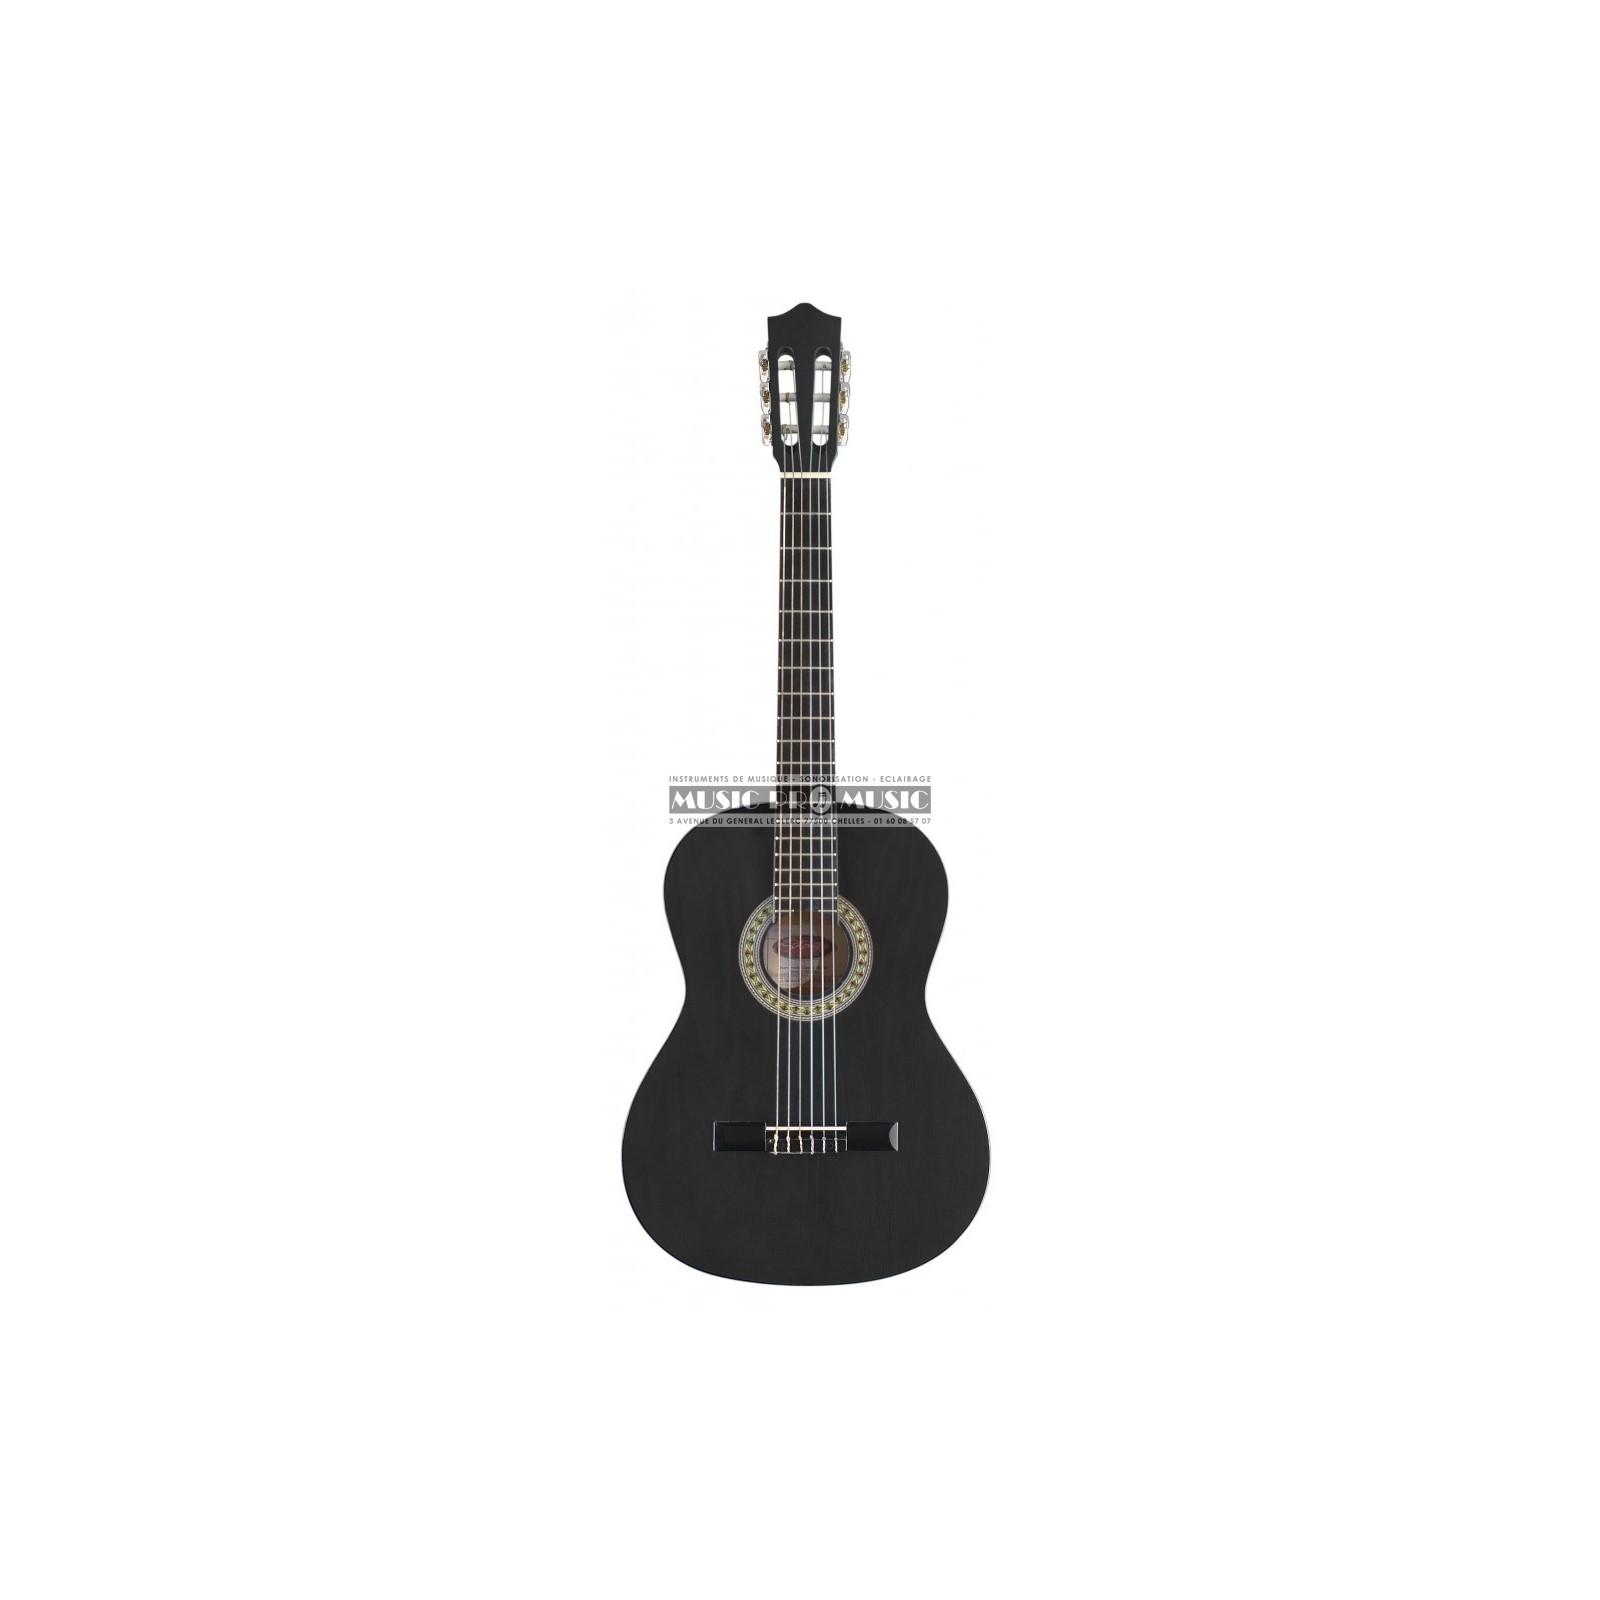 stagg c530 bk guitare classique 3 4 noir. Black Bedroom Furniture Sets. Home Design Ideas